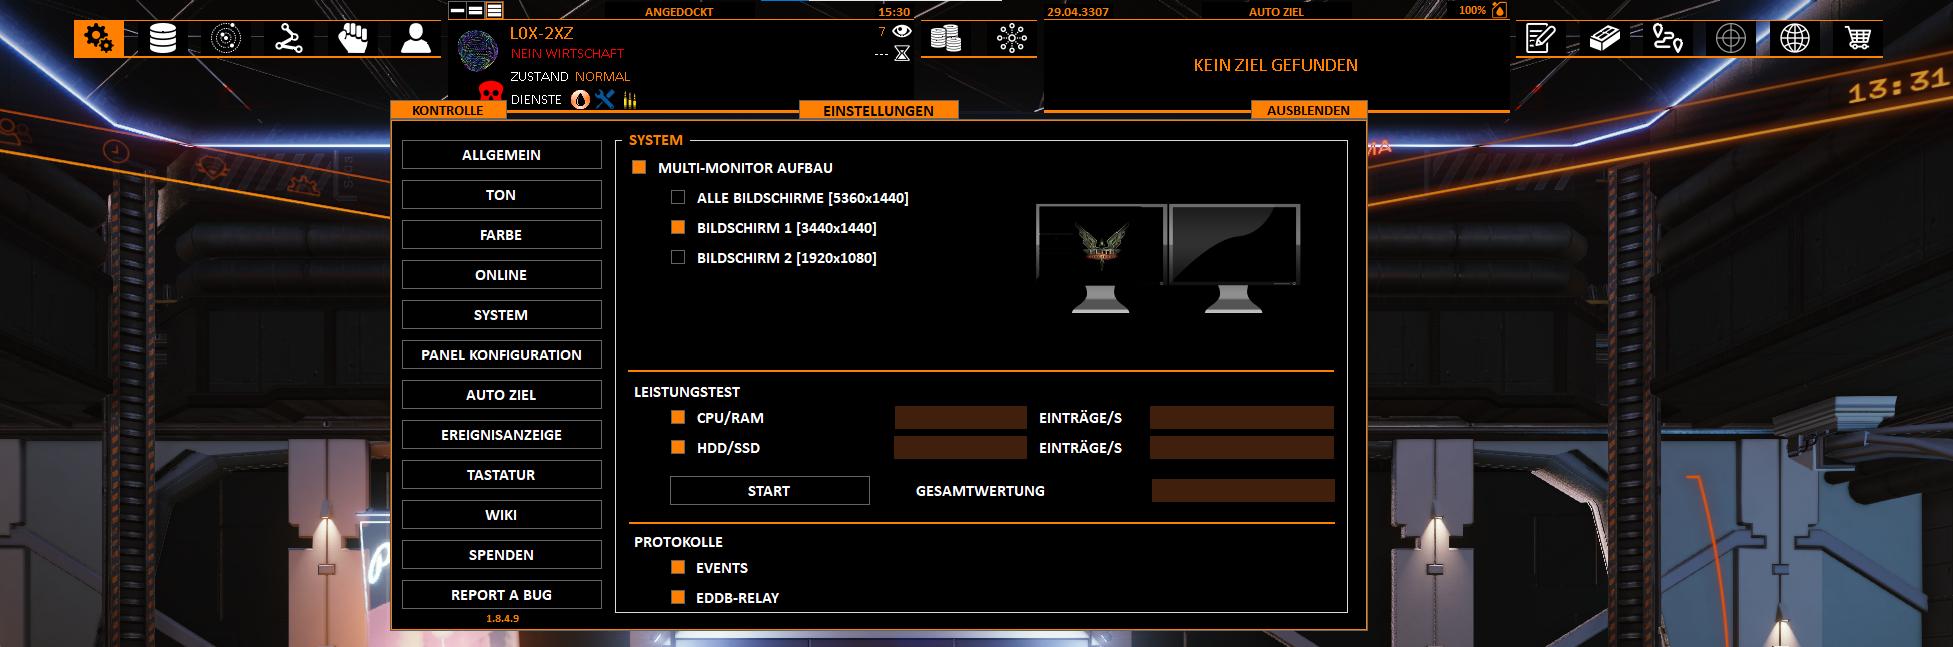 Screenshot 2021-04-29 153210.png